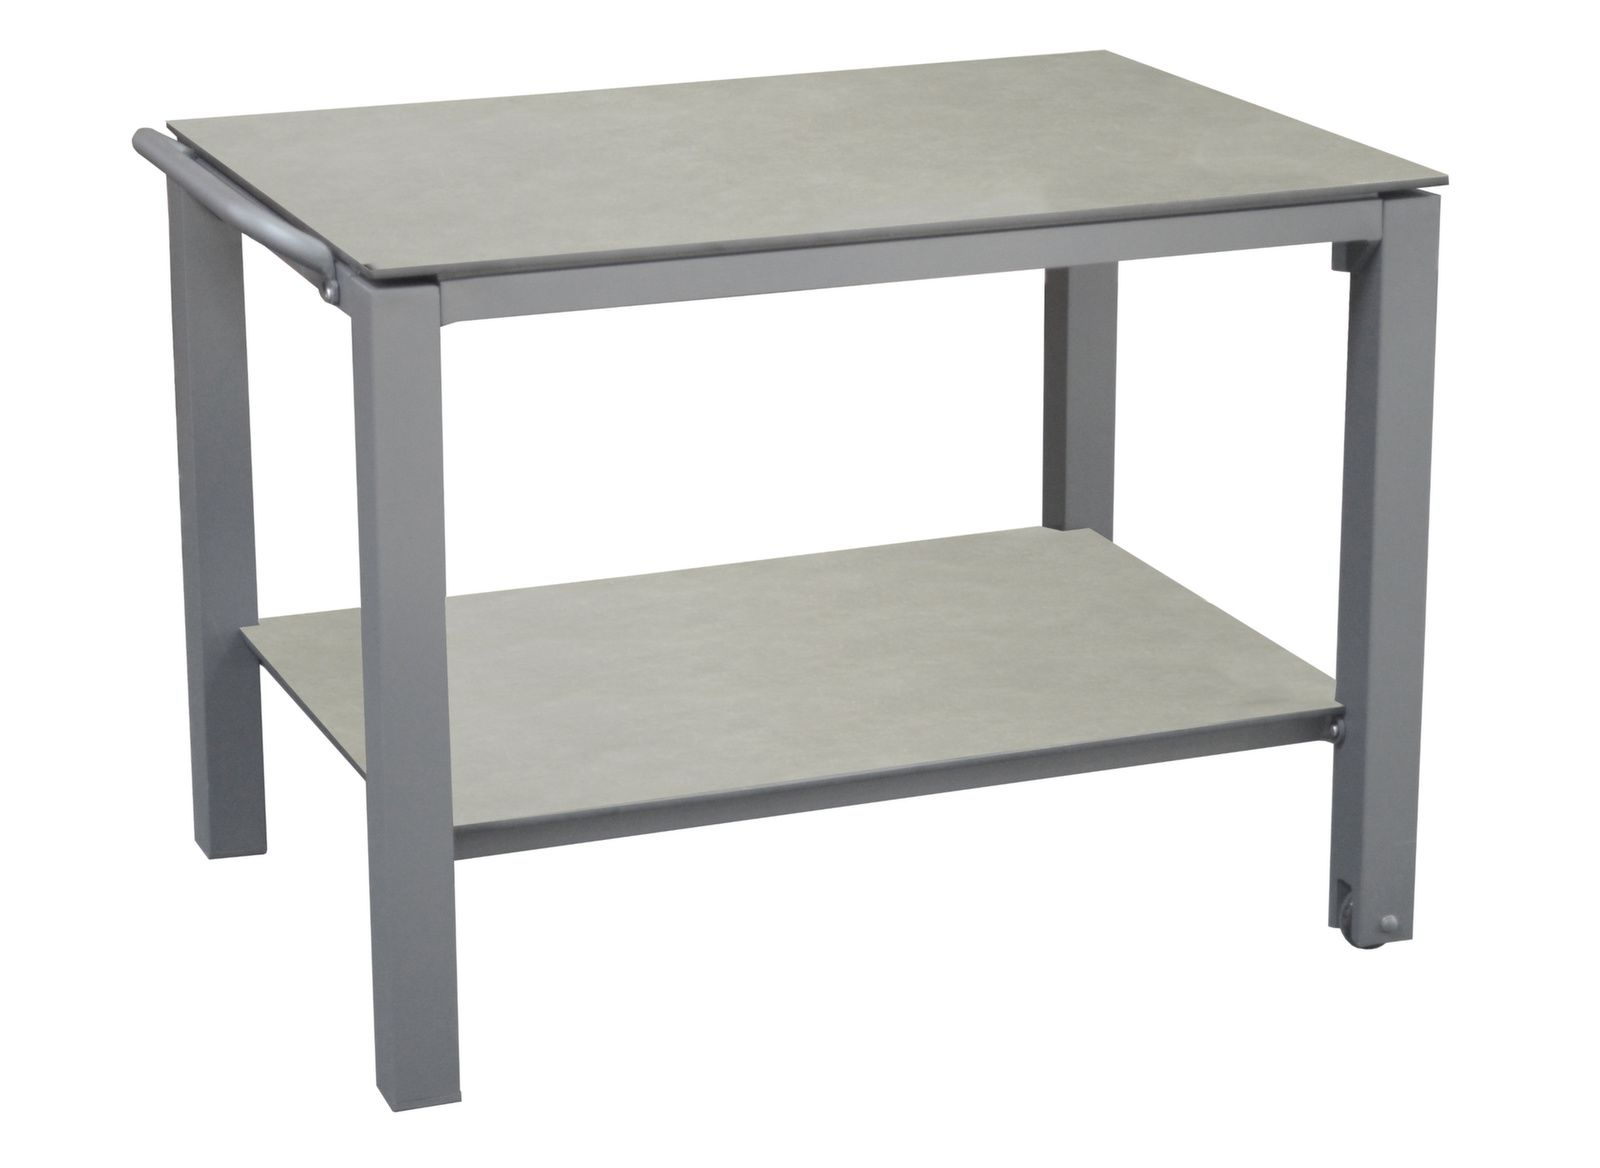 table plancha 100 x 70 cm plateau trespa